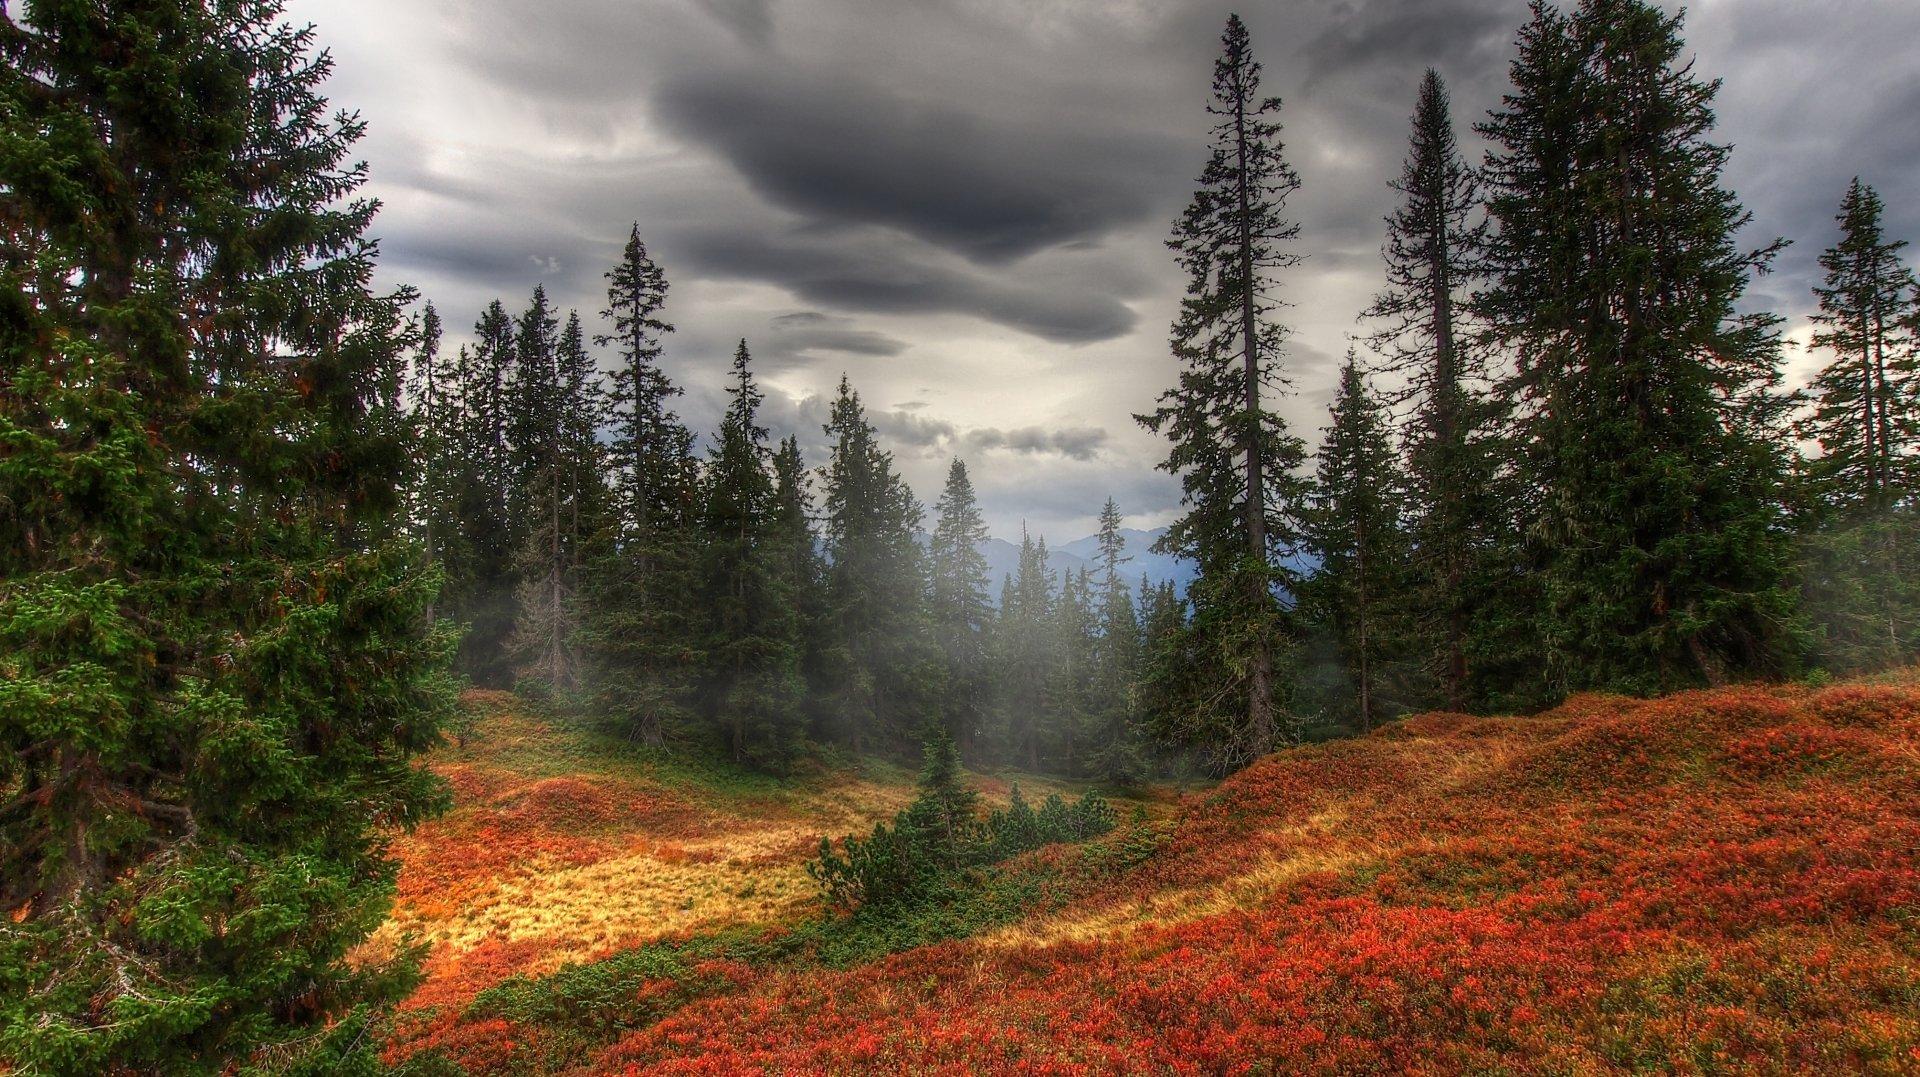 Tierra/Naturaleza - Bosque  Árbol Tierra/Naturaleza Pine Tree Otoño Foliage Fondo de Pantalla